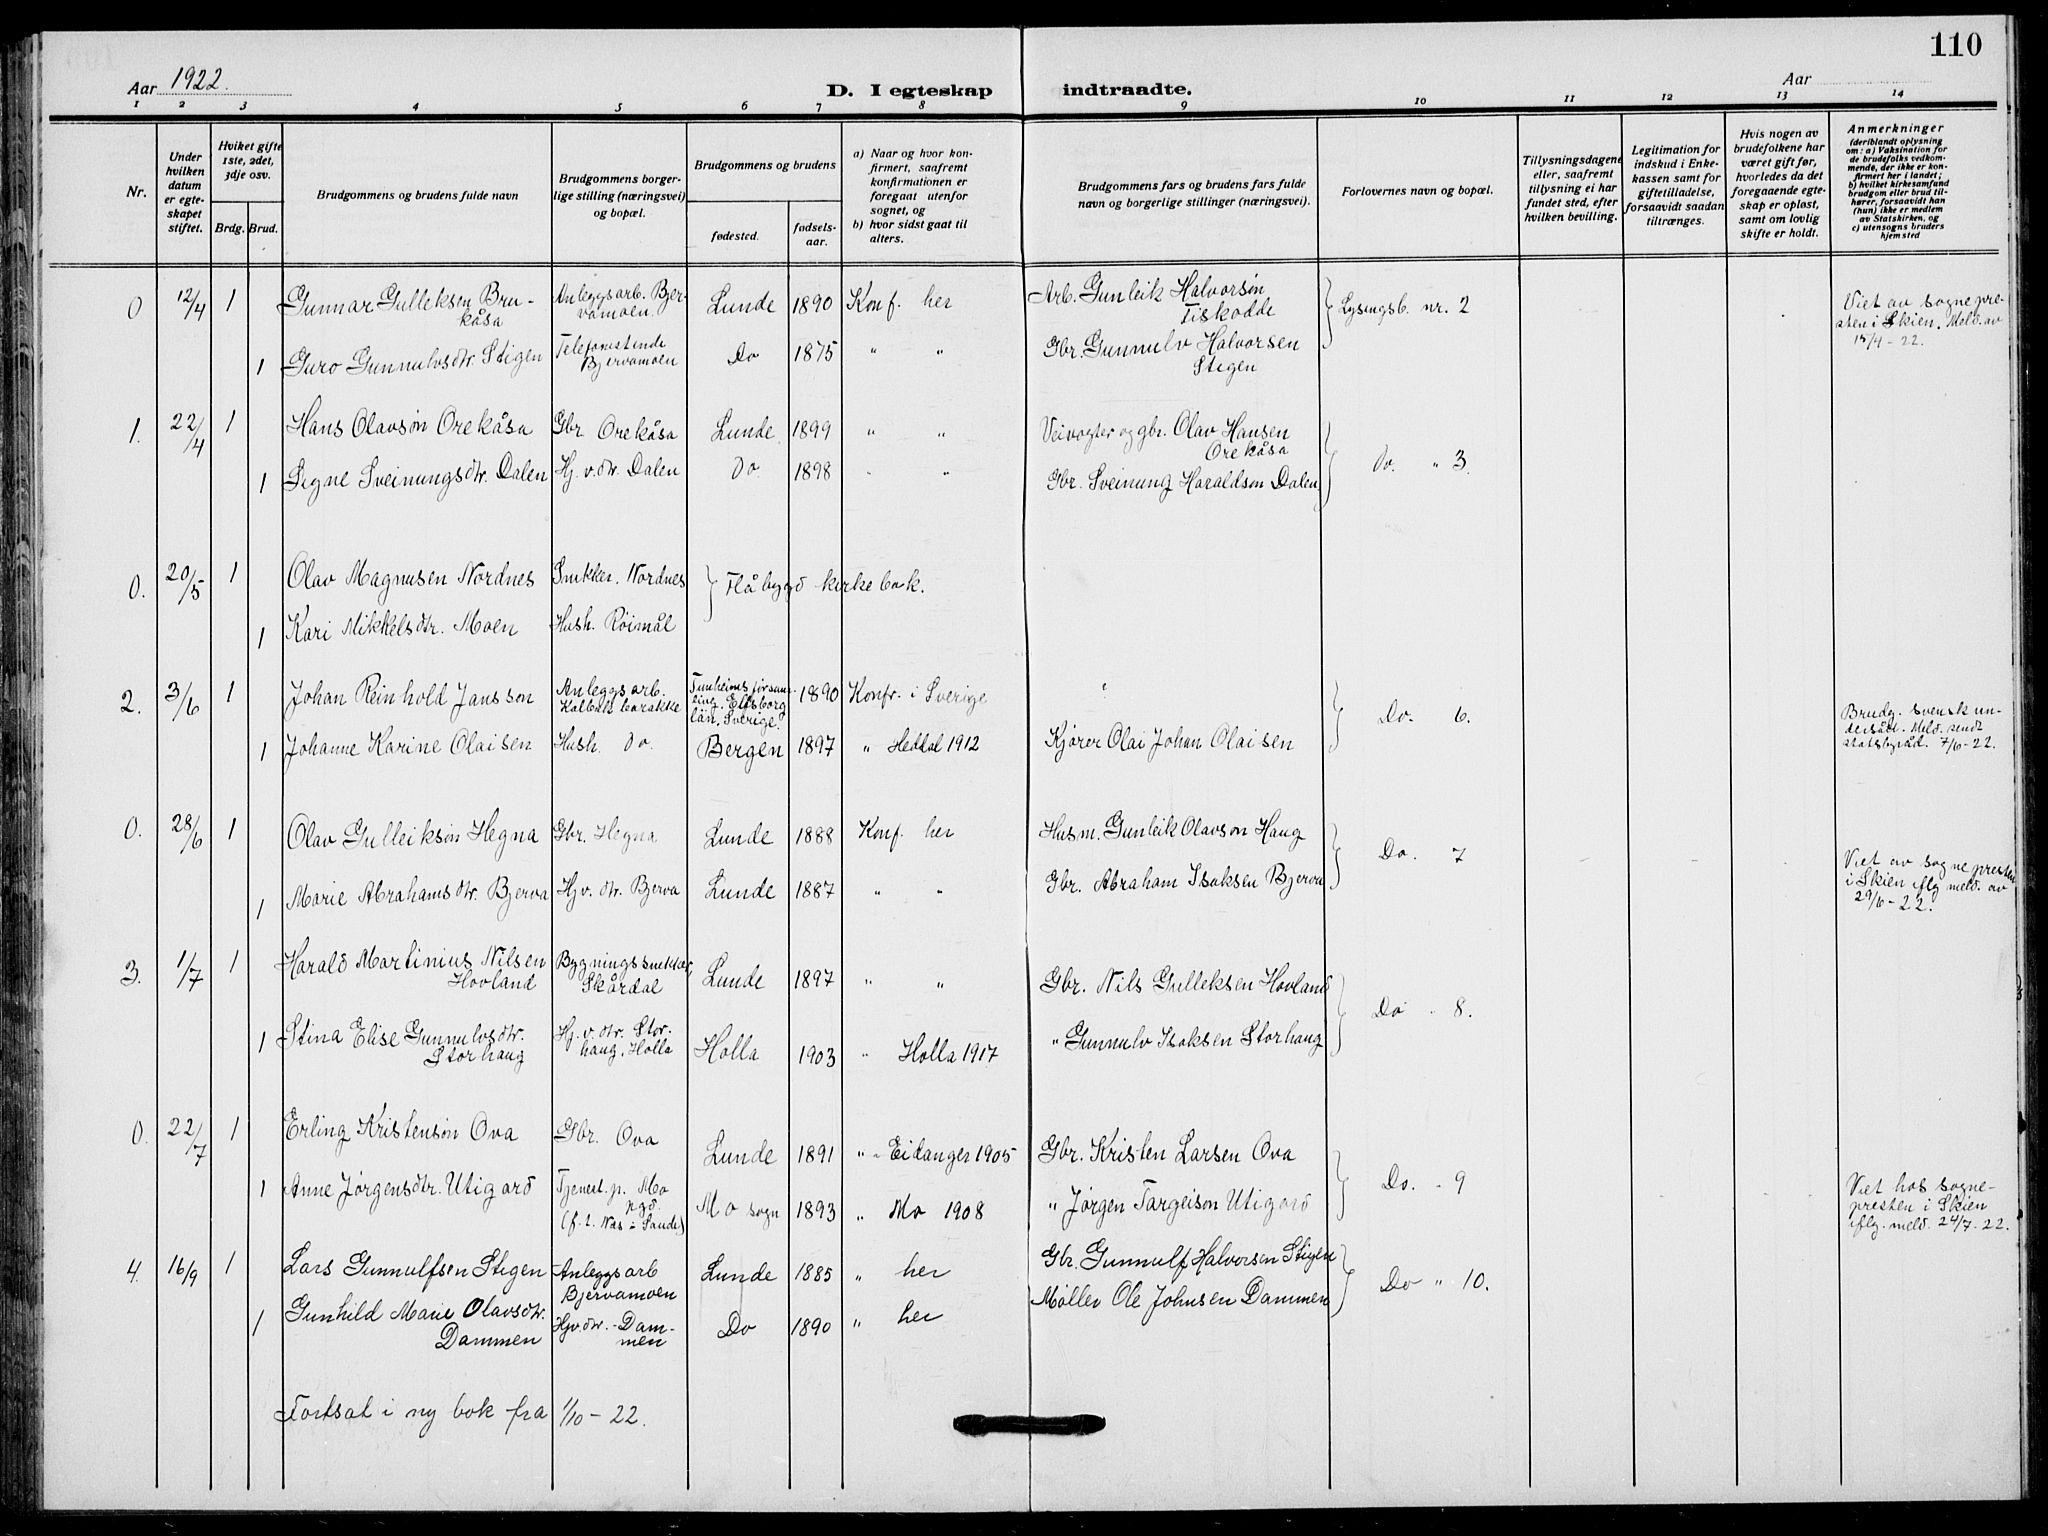 SAKO, Lunde kirkebøker, F/Fa/L0005: Ministerialbok nr. I 5, 1914-1922, s. 110